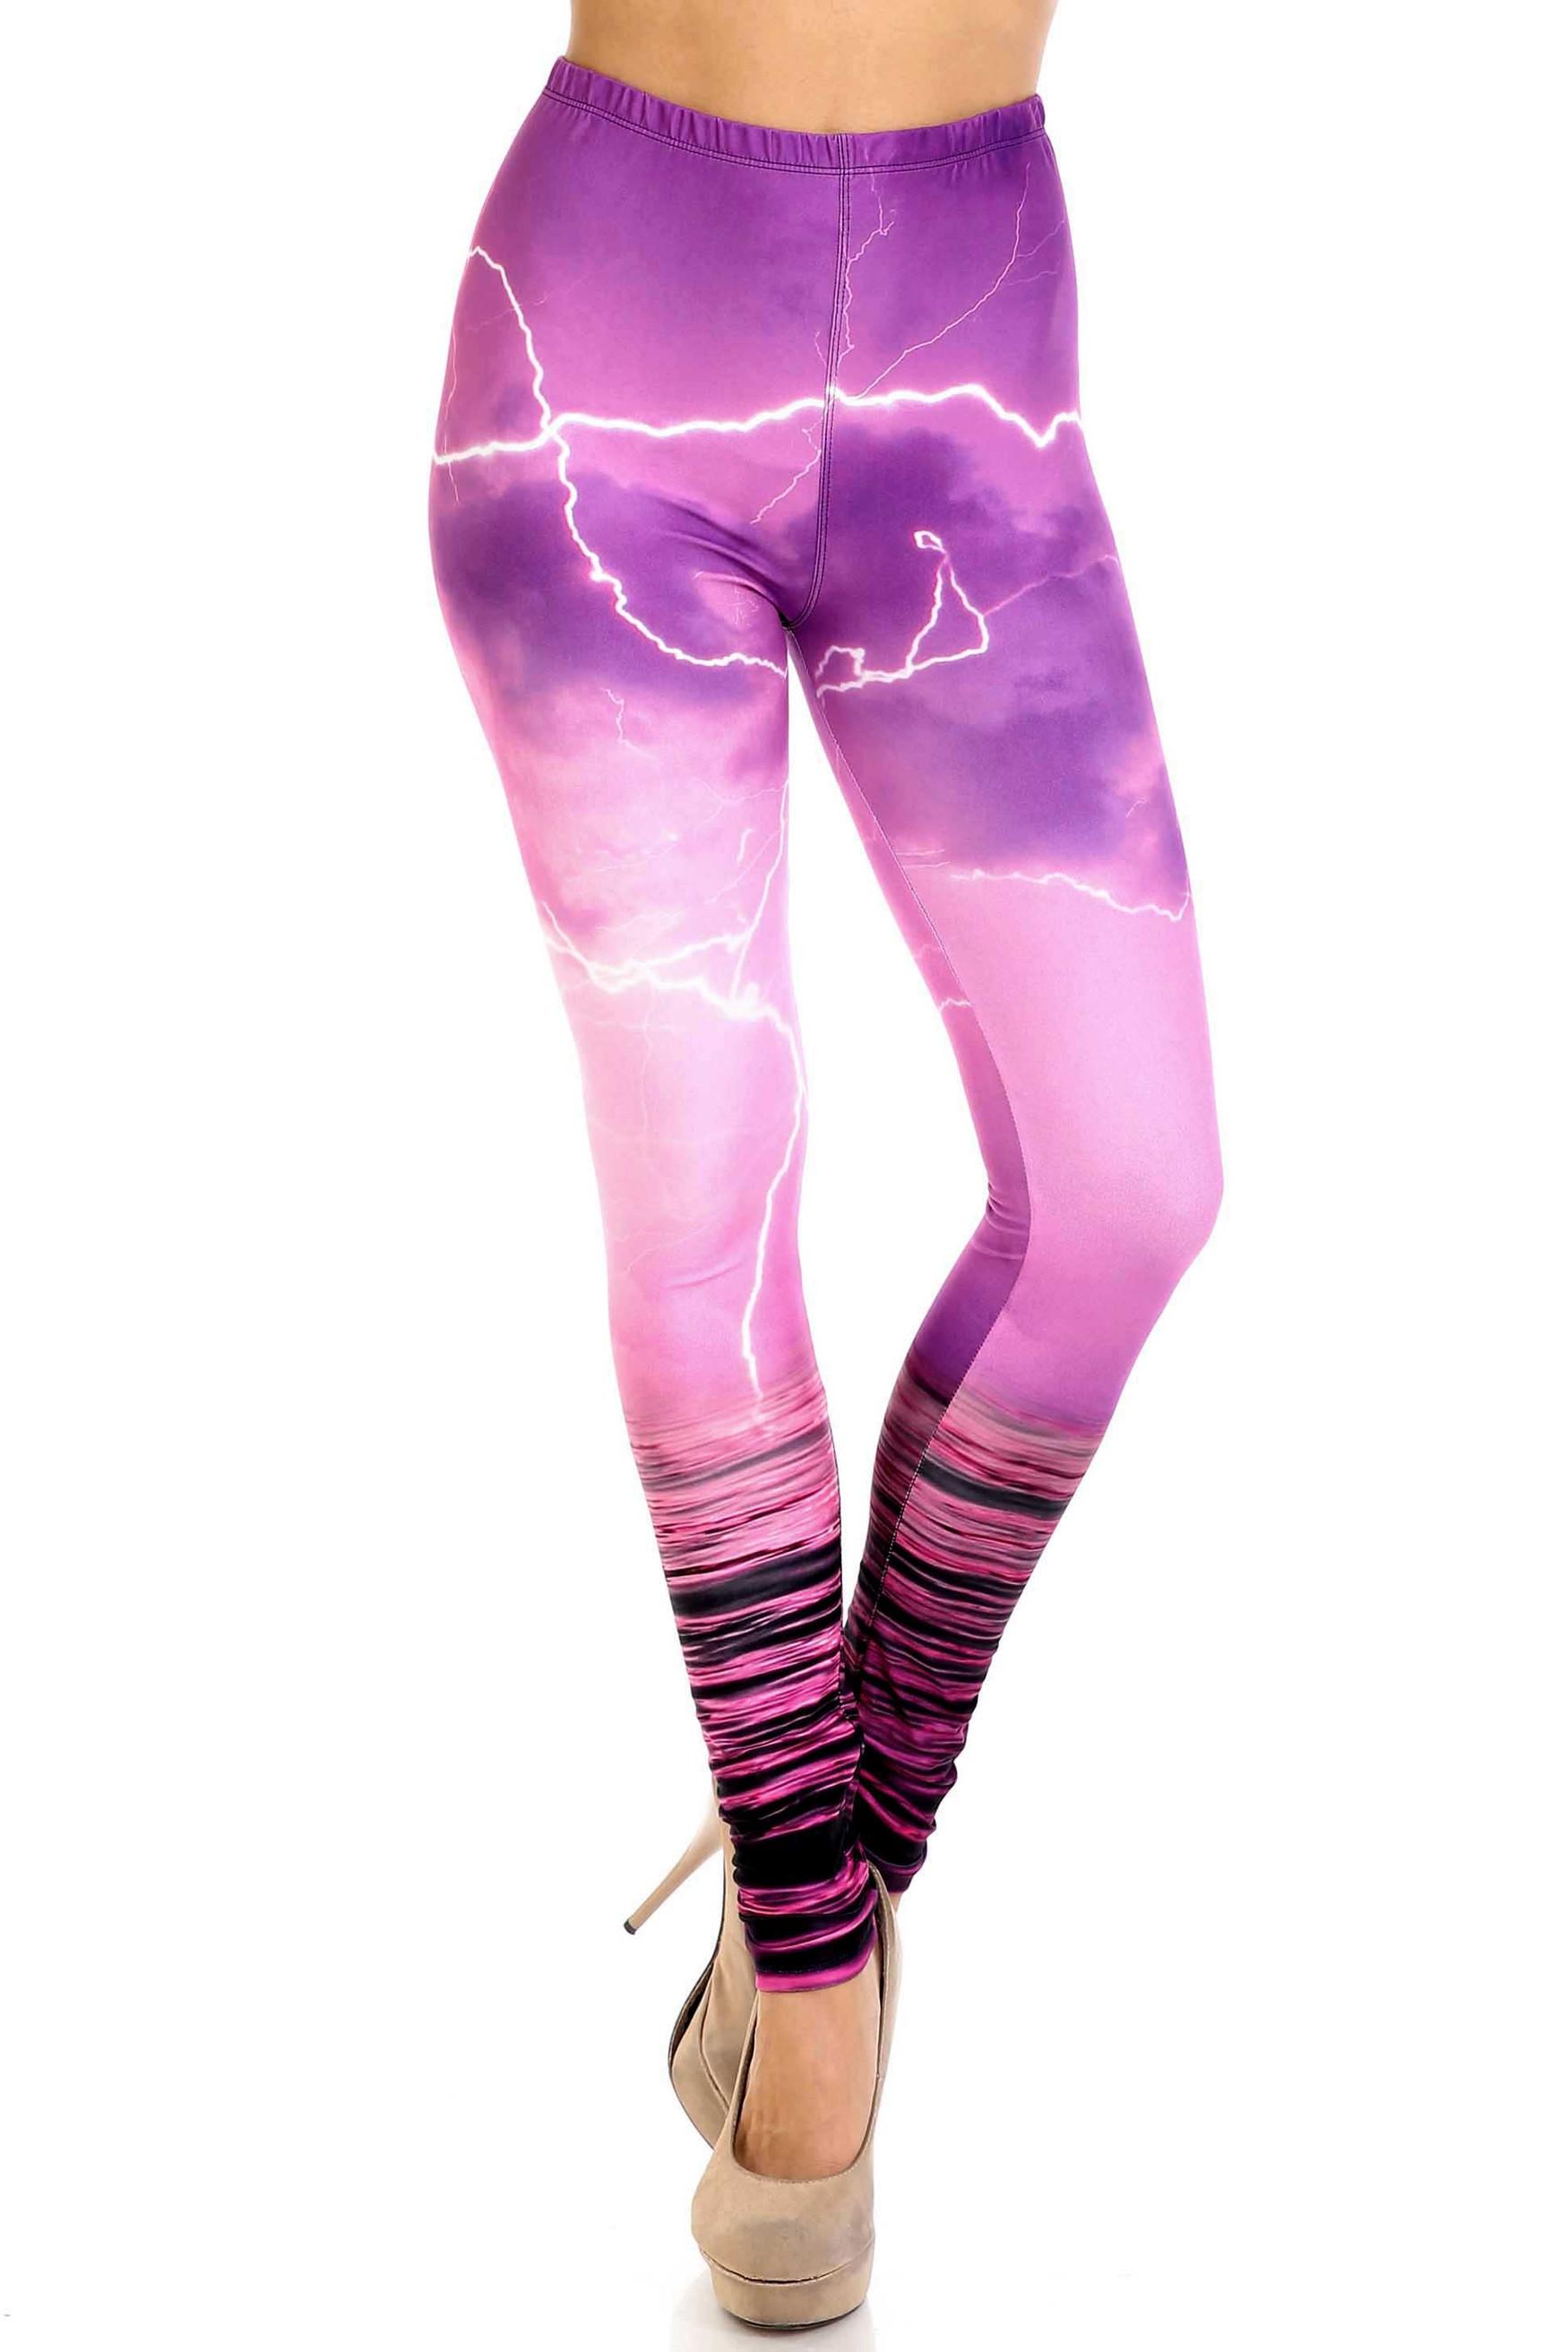 Creamy Soft Pink Lightning Storm Leggings - USA Fashion™